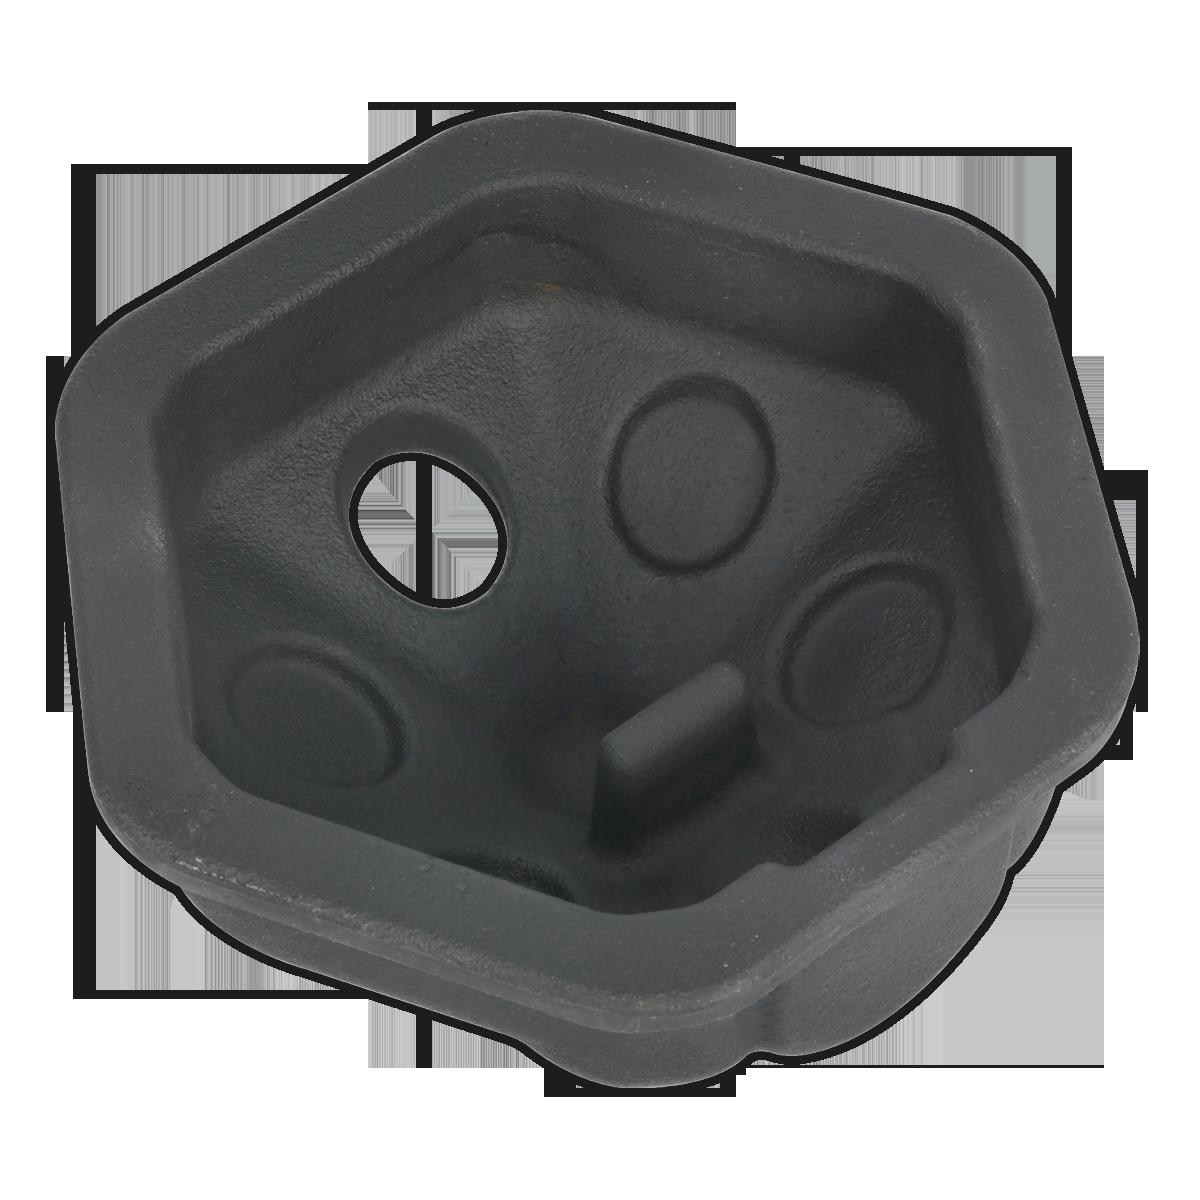 Axle Nut Socket 140mm 32/46mm Hex Drive